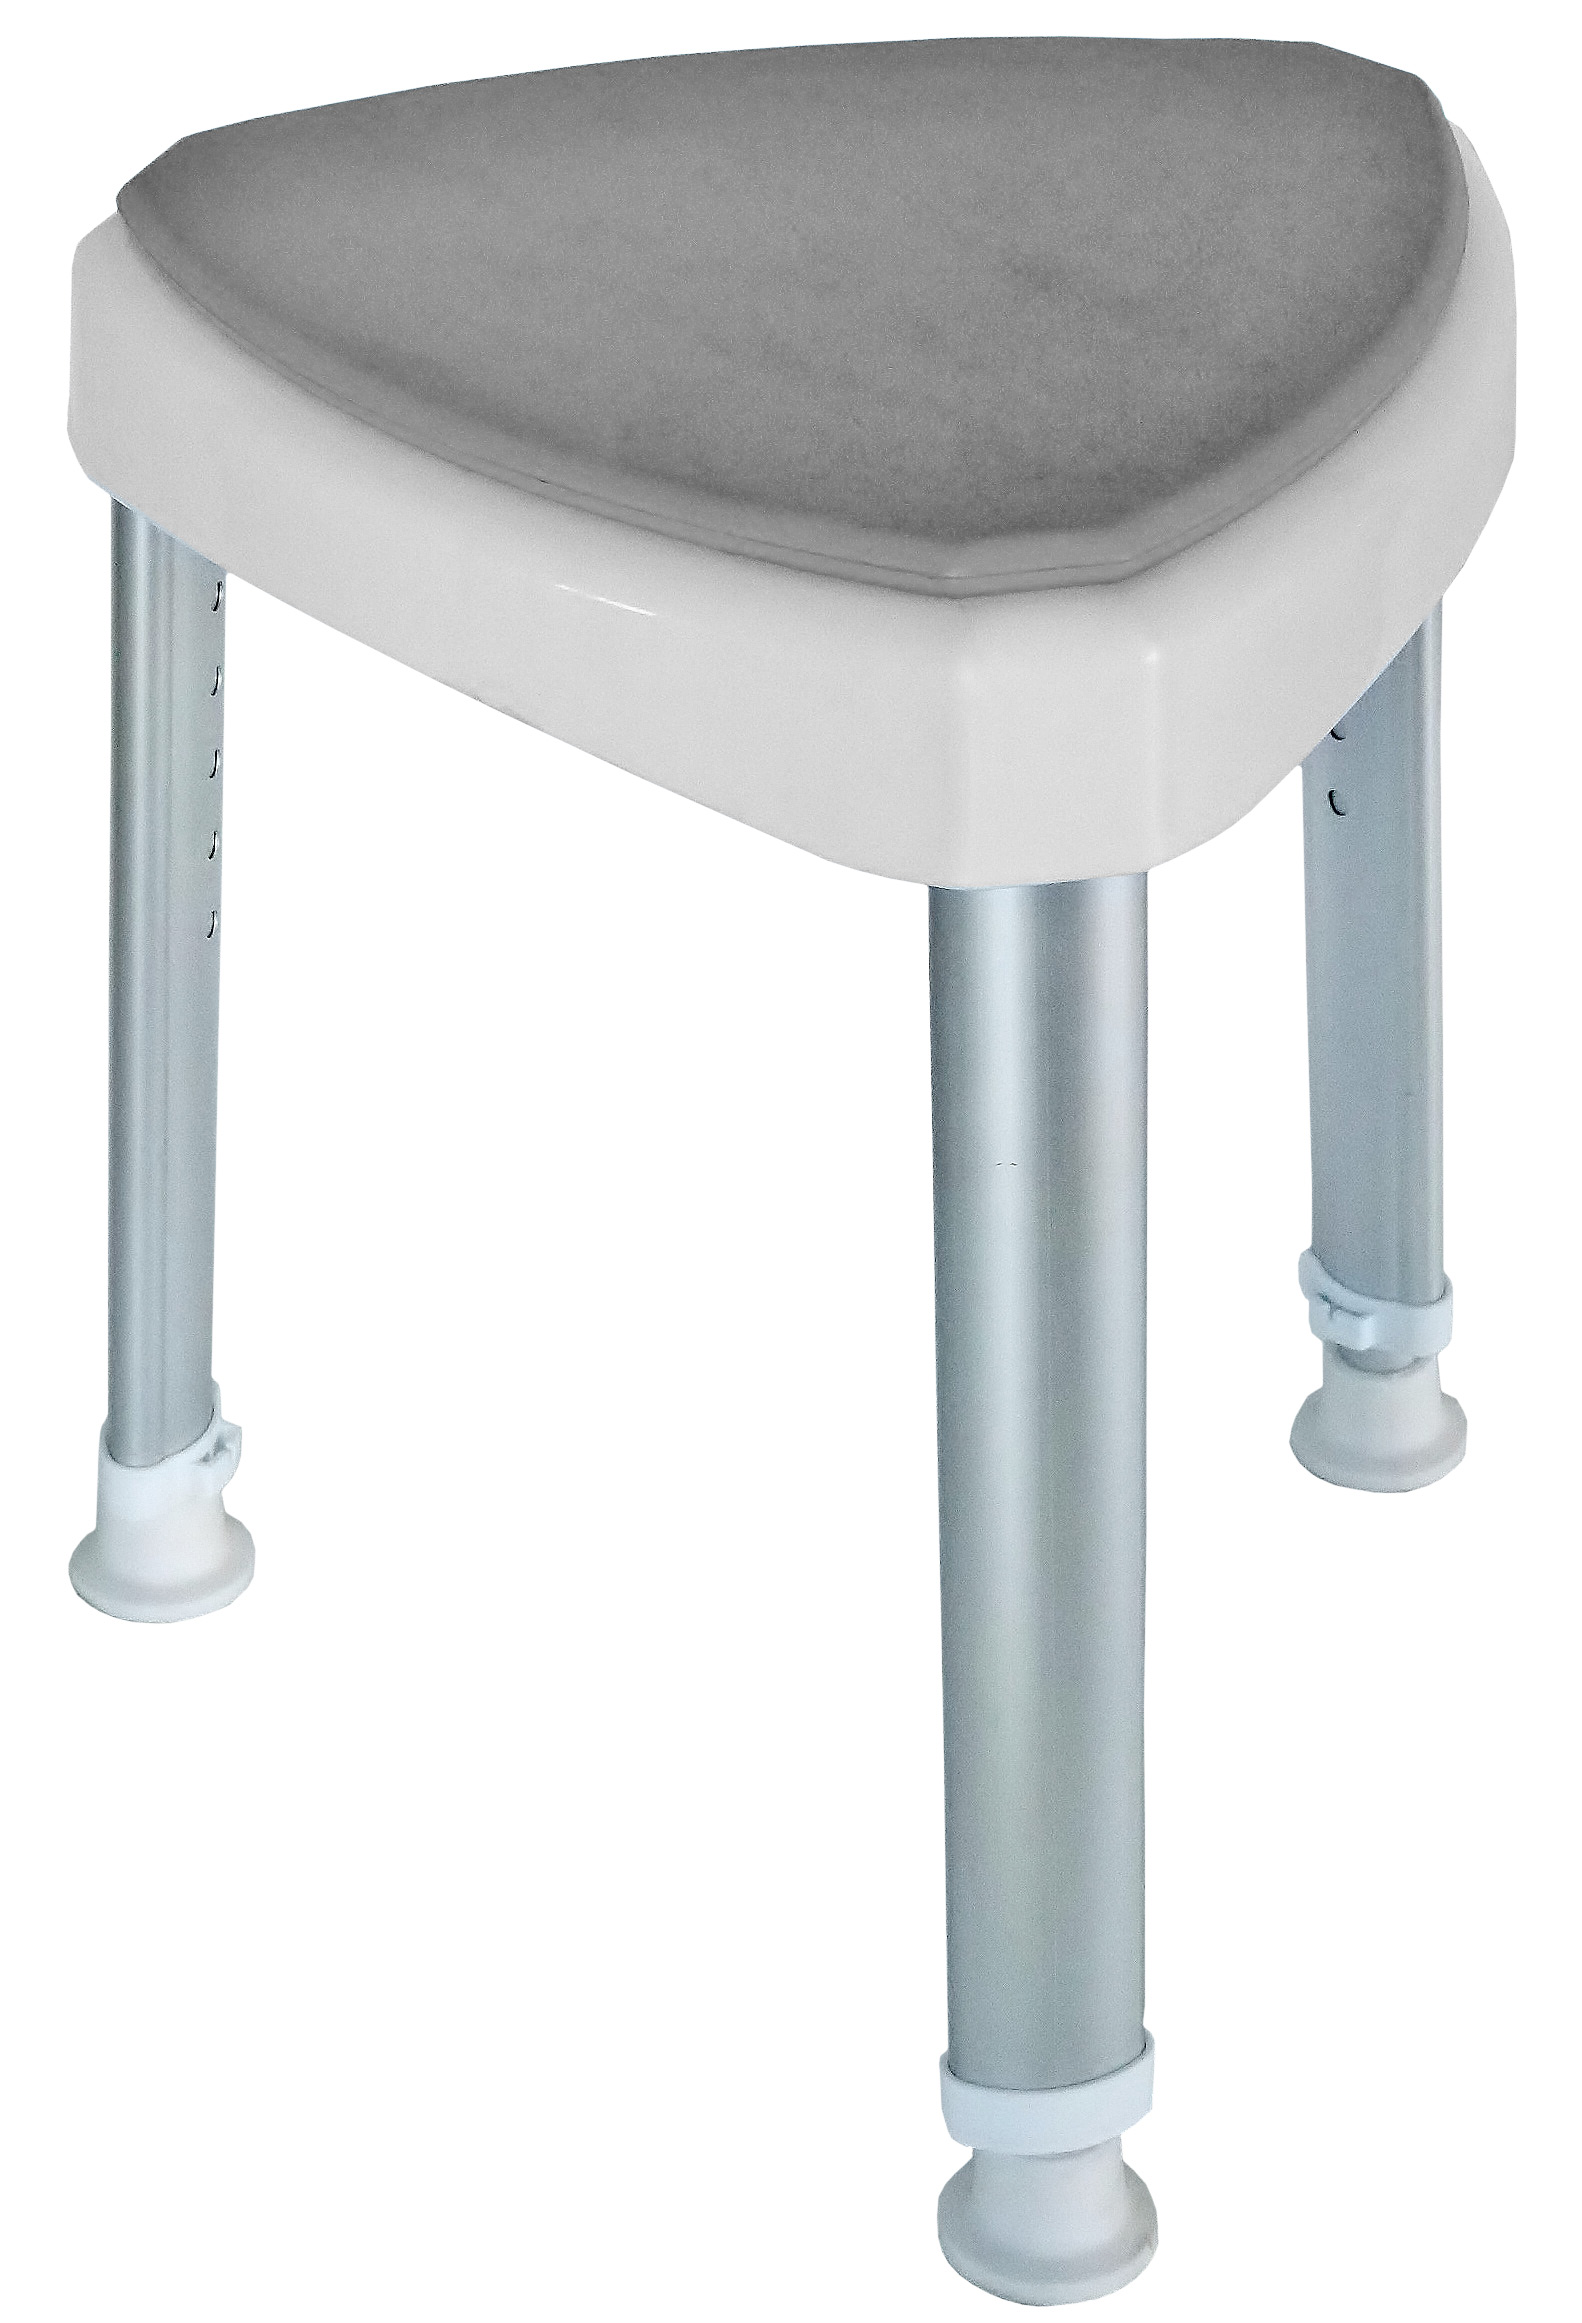 Triangular shower stool » Mobilex